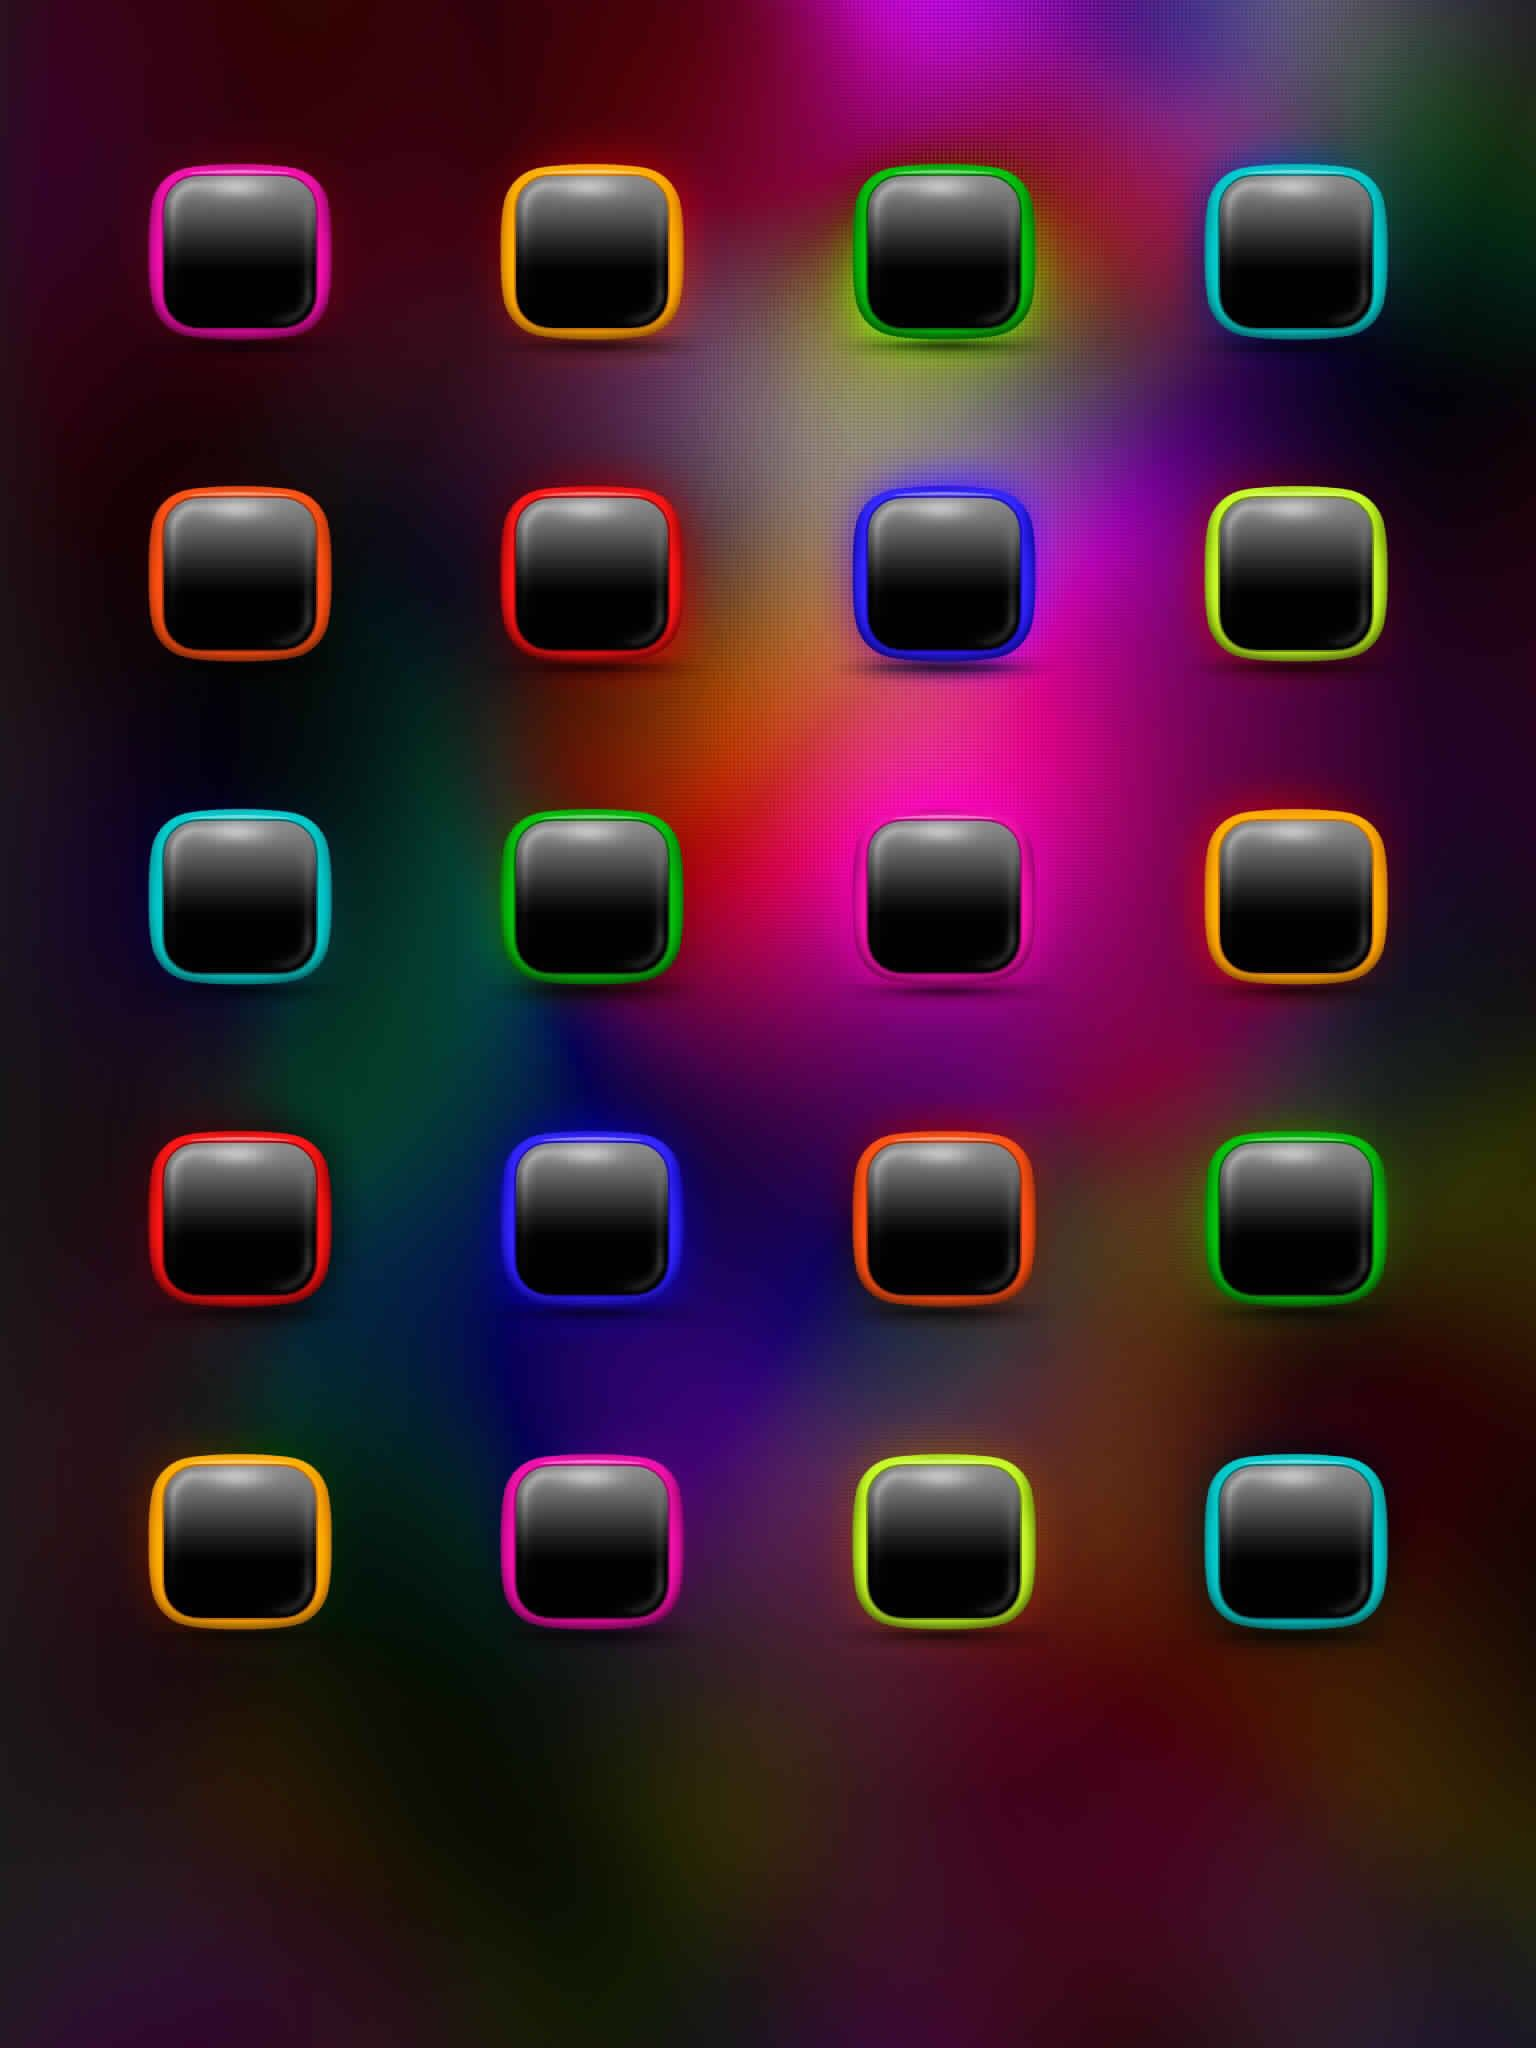 App Icon Skin Wallpaper Ipad Mini Iphone New